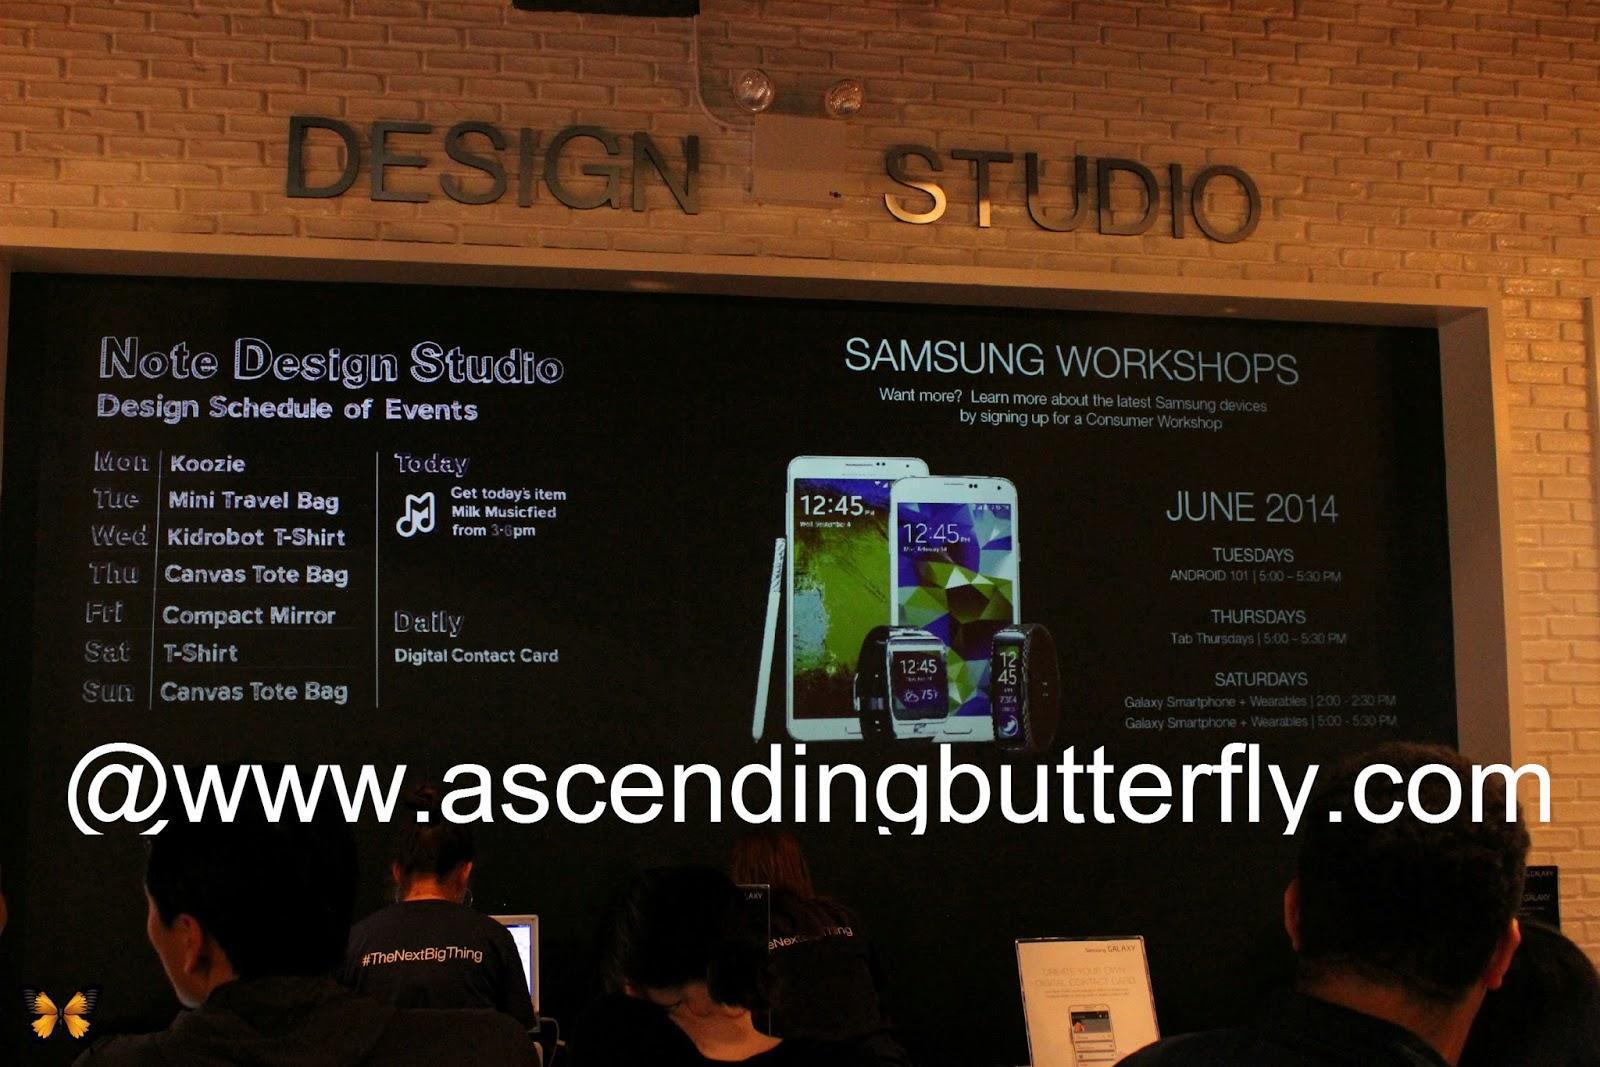 Design Studio at the SoHo Samsung Galaxy Studio